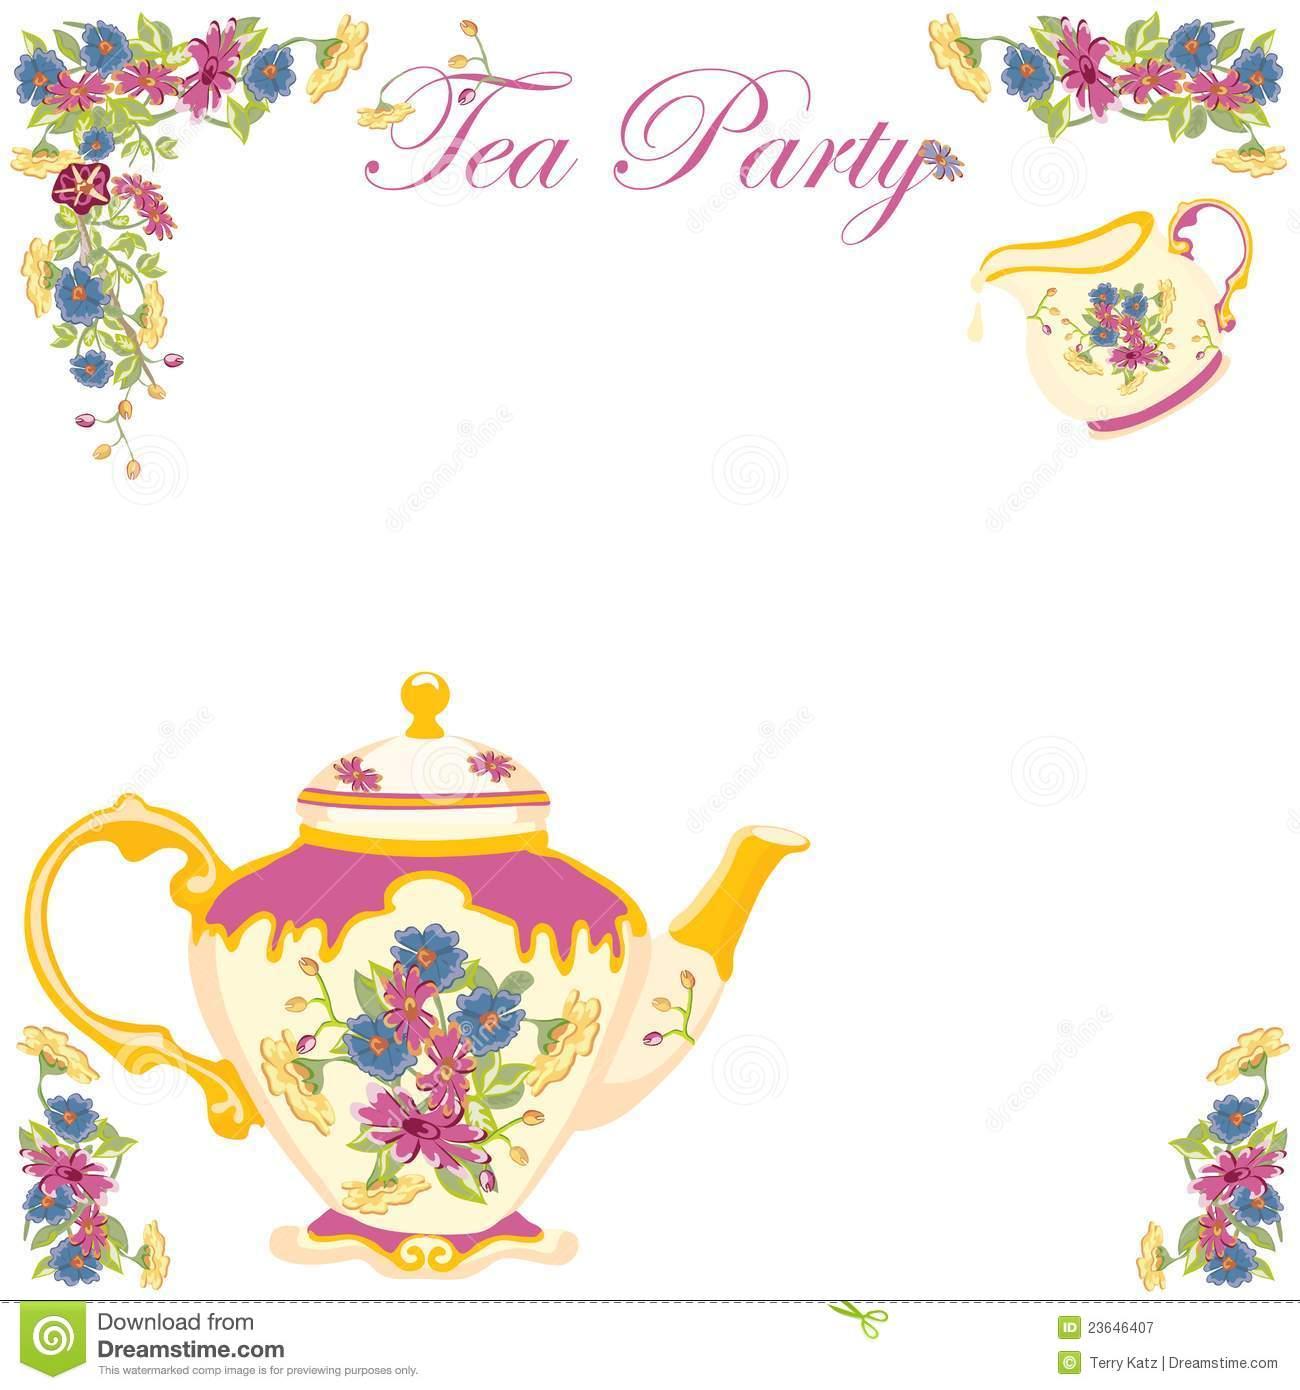 clipart tea party invitation - photo #38